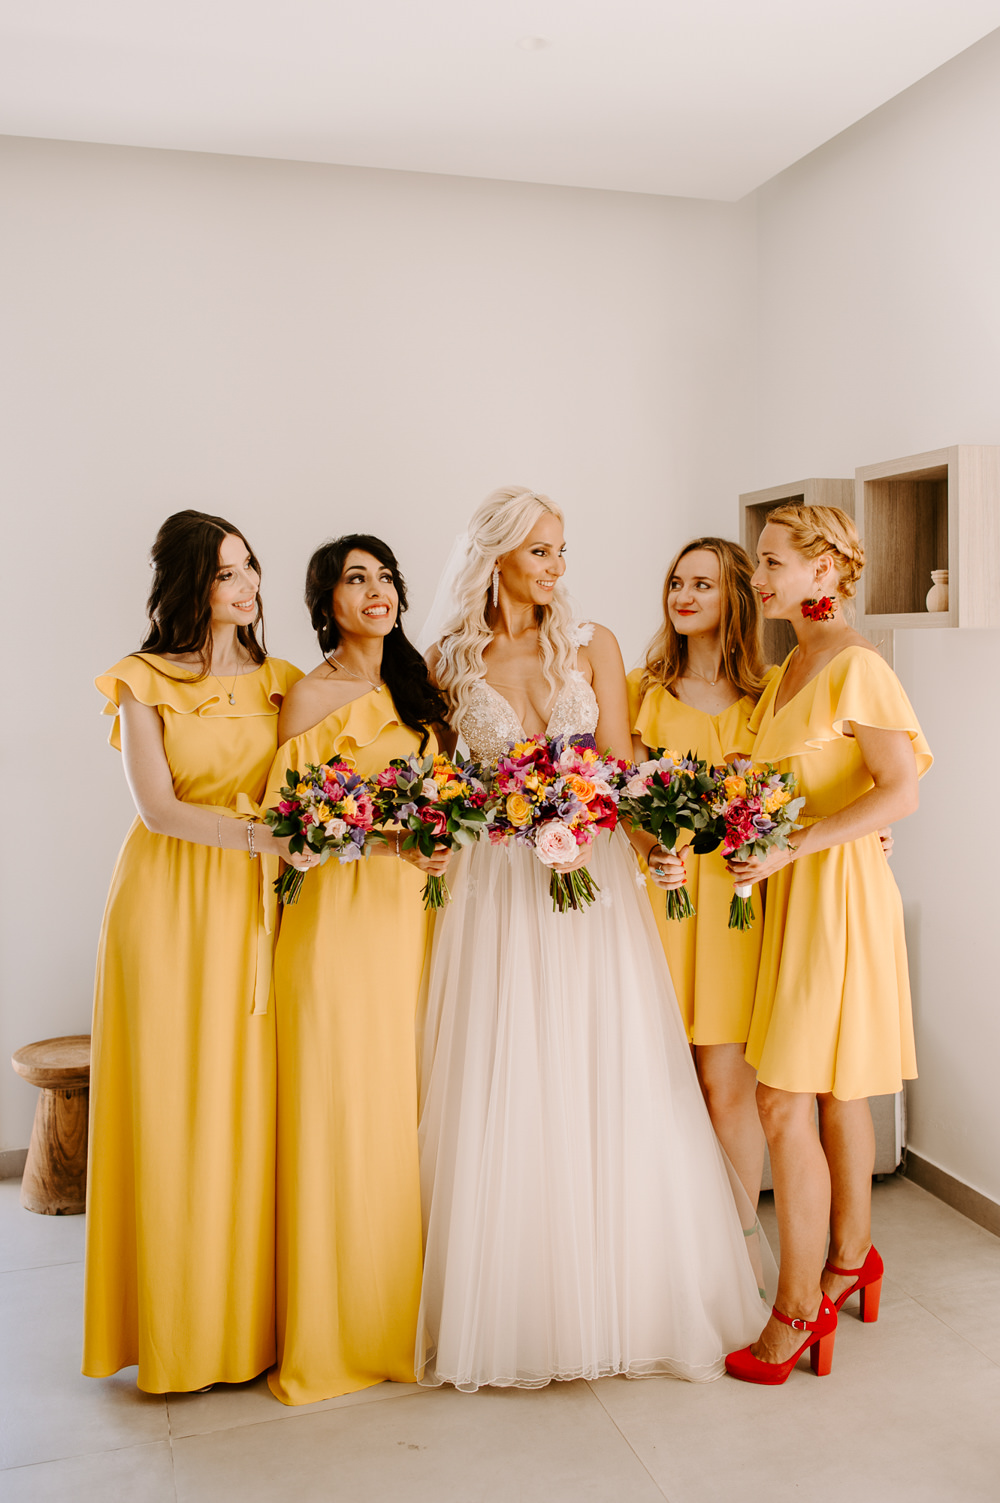 Bridesmaids Bridesmaid Dress Dresses Yellow Santorini Wedding Phosart Photography